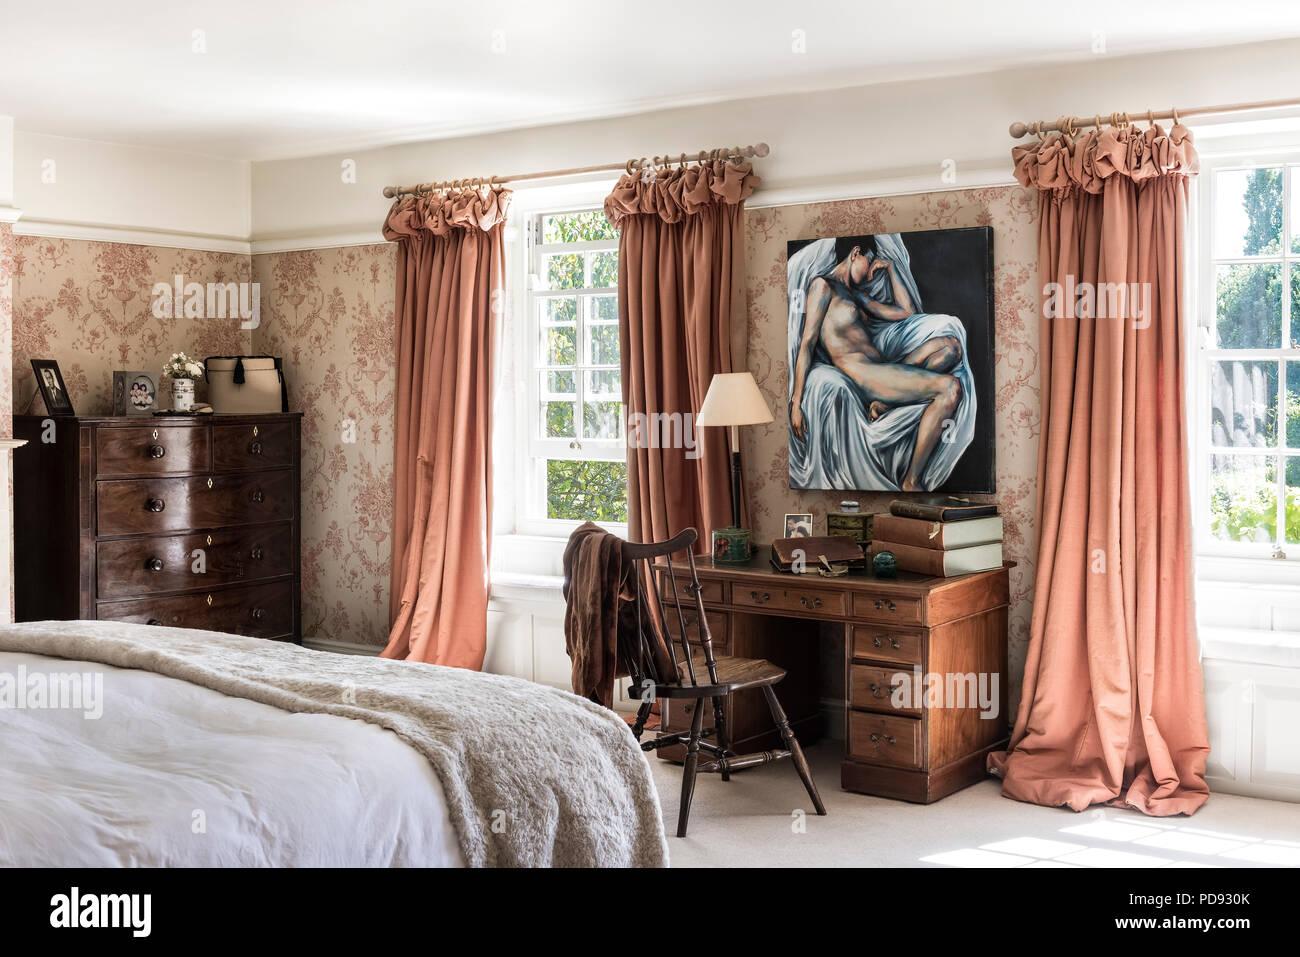 Toile De Jouy Wallpaper In Bedroom With Heavy Linen Curtains